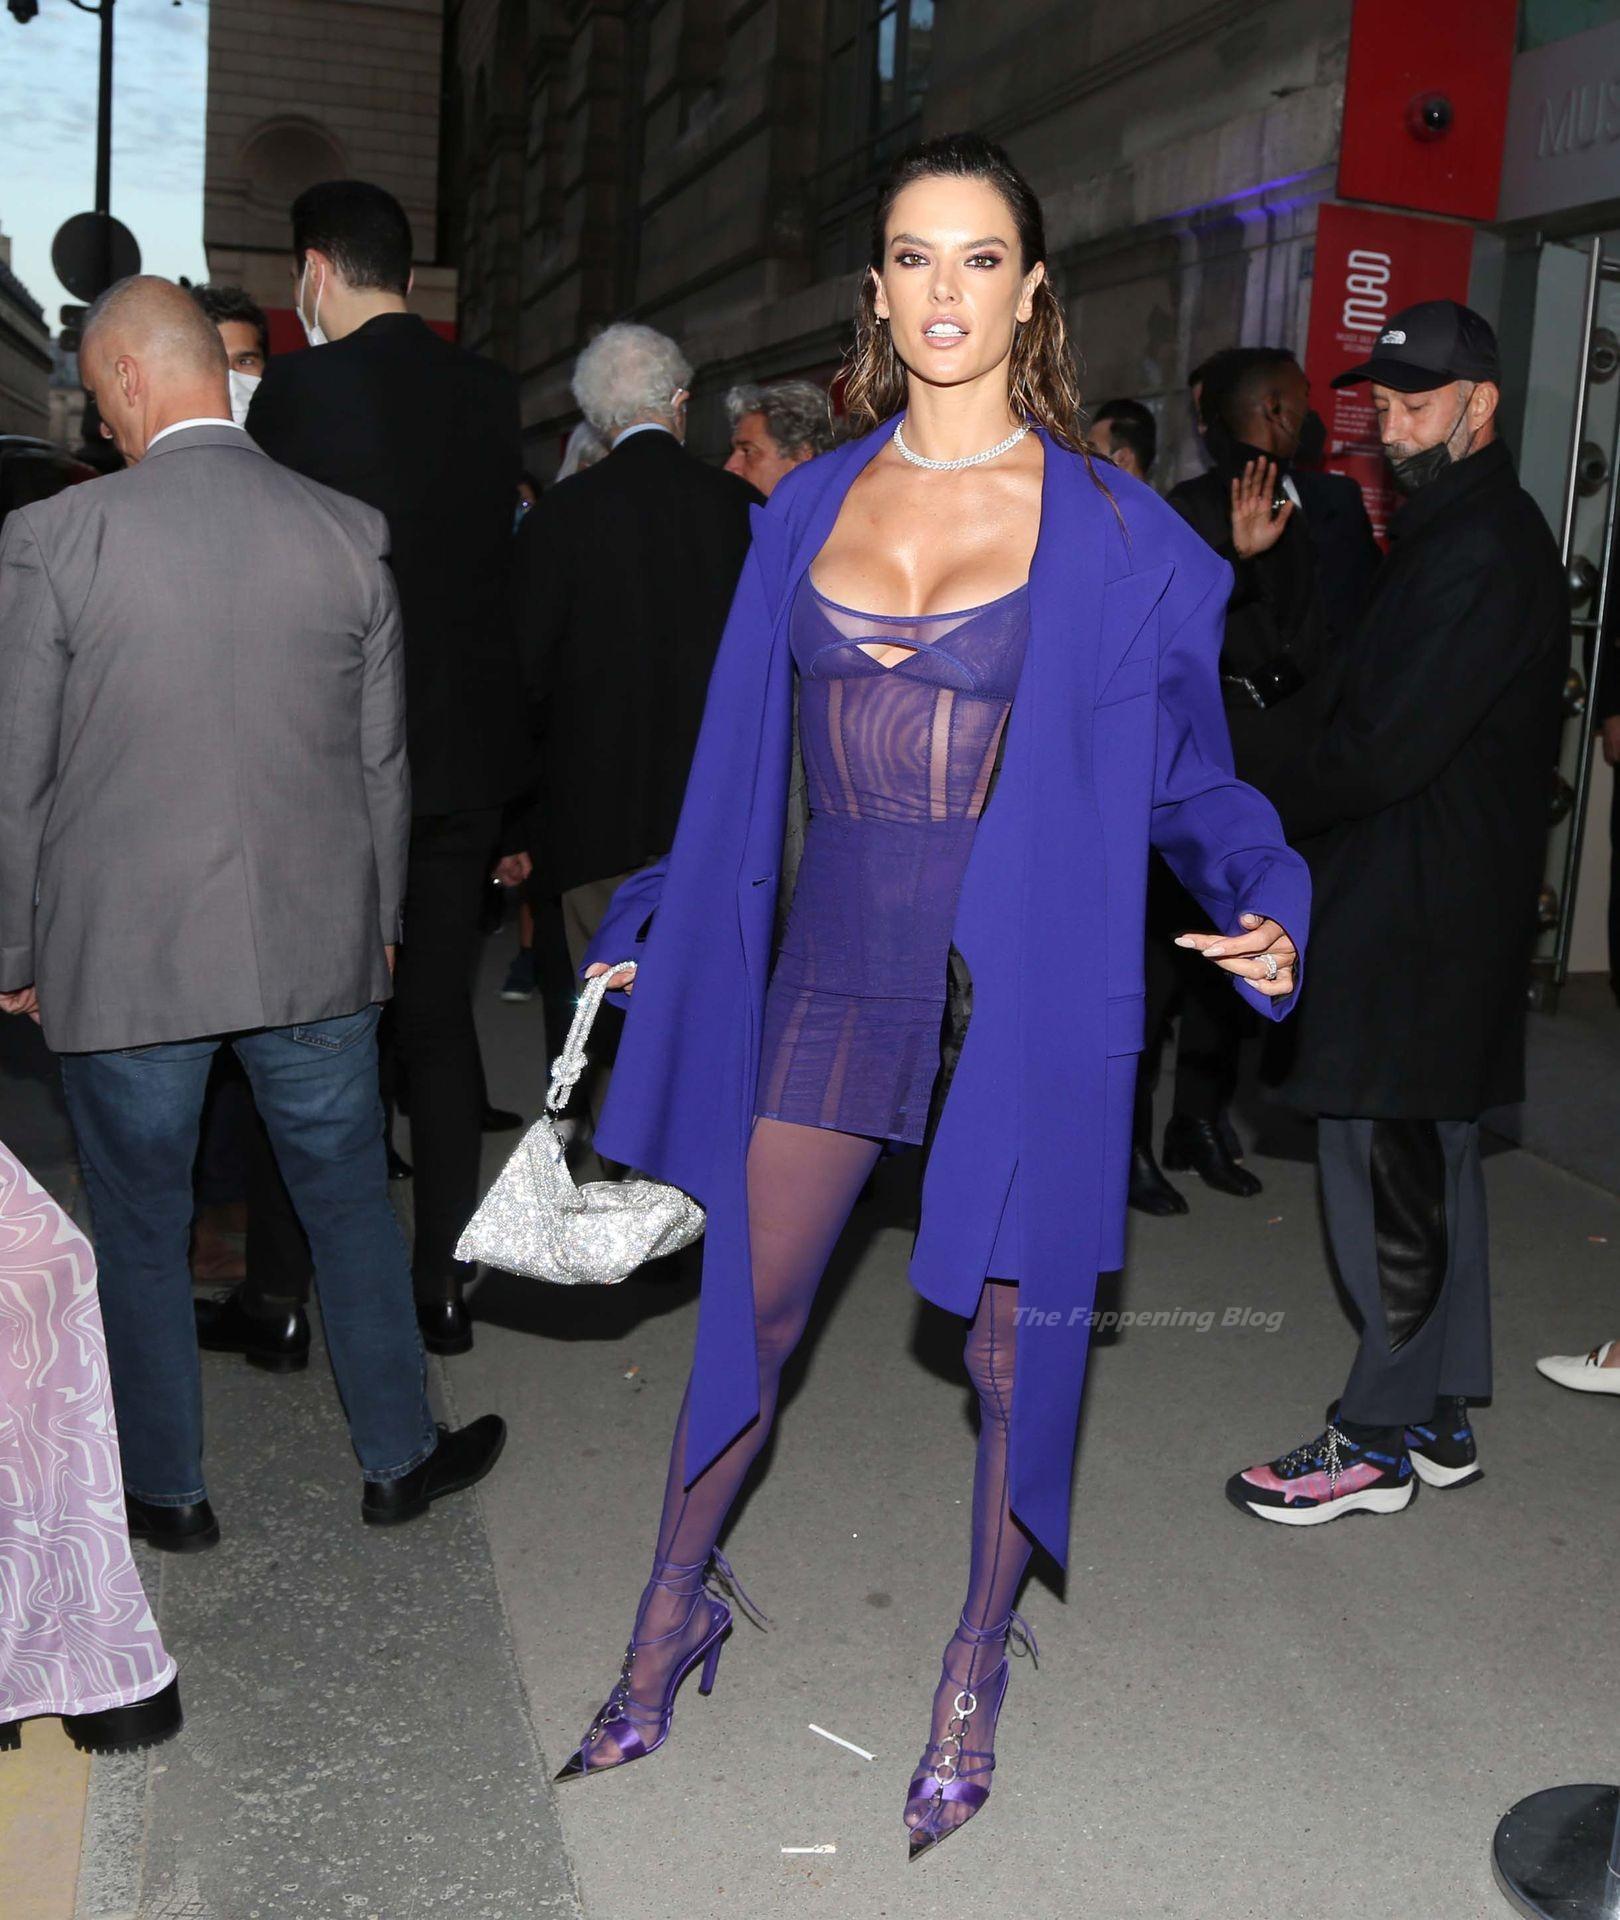 Alessandra-Ambrosio-Sexy-The-Fappening-Blog-66-1.jpg